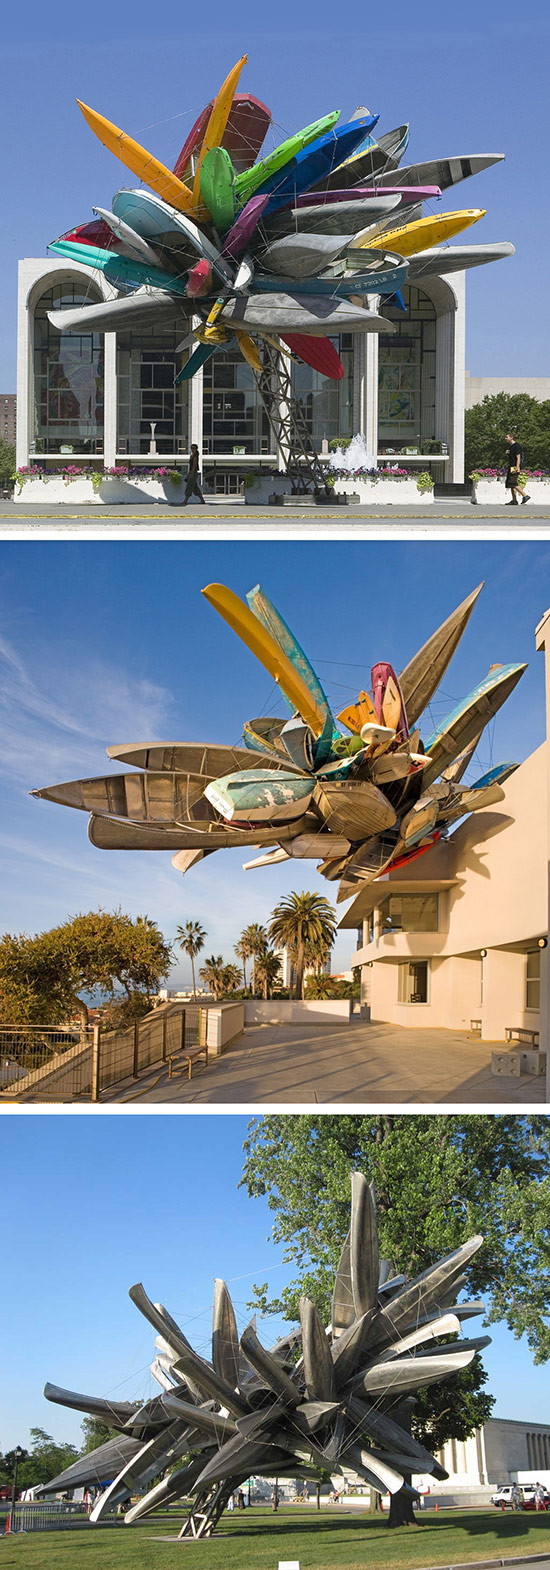 Artist Nancy Rubins, sculptures made from boats